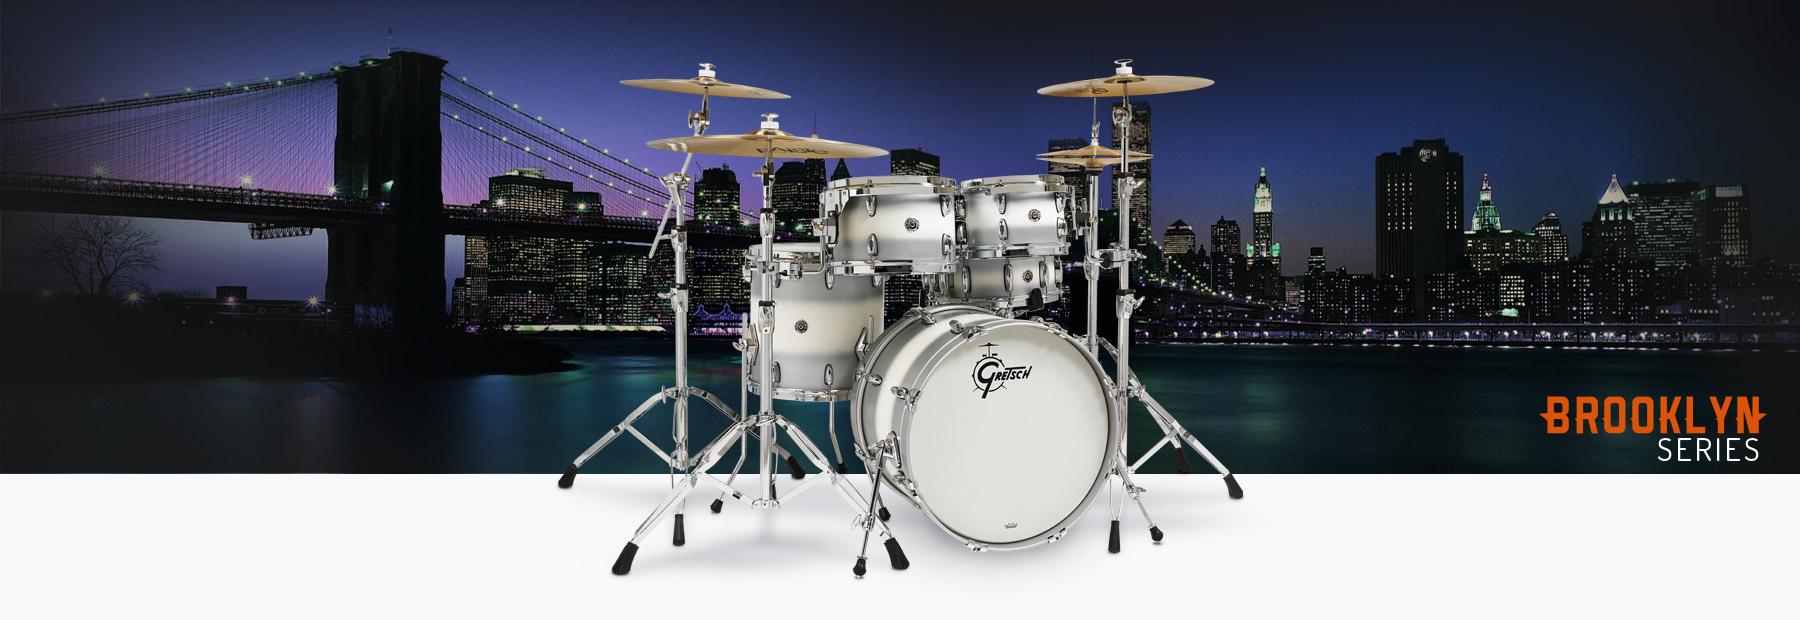 Brooklyn Gretsch Drums Snare Drum Diagram